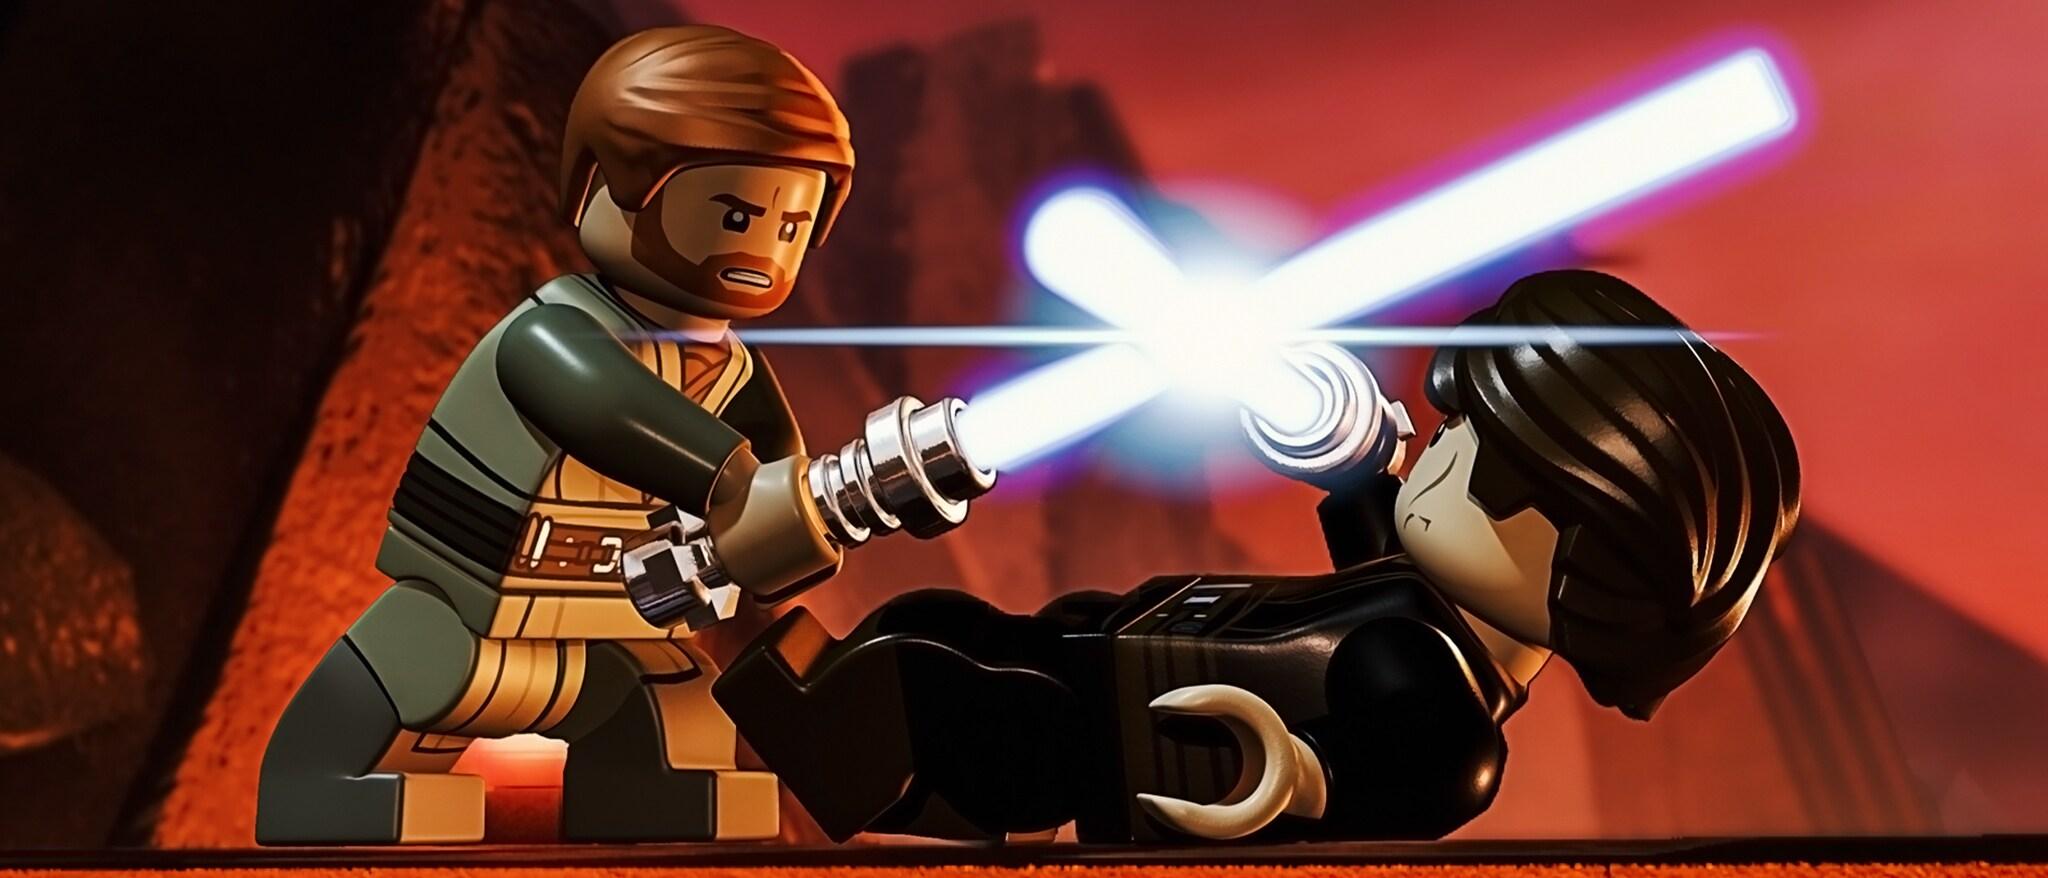 LEGO Star Wars: Droid Tales hero